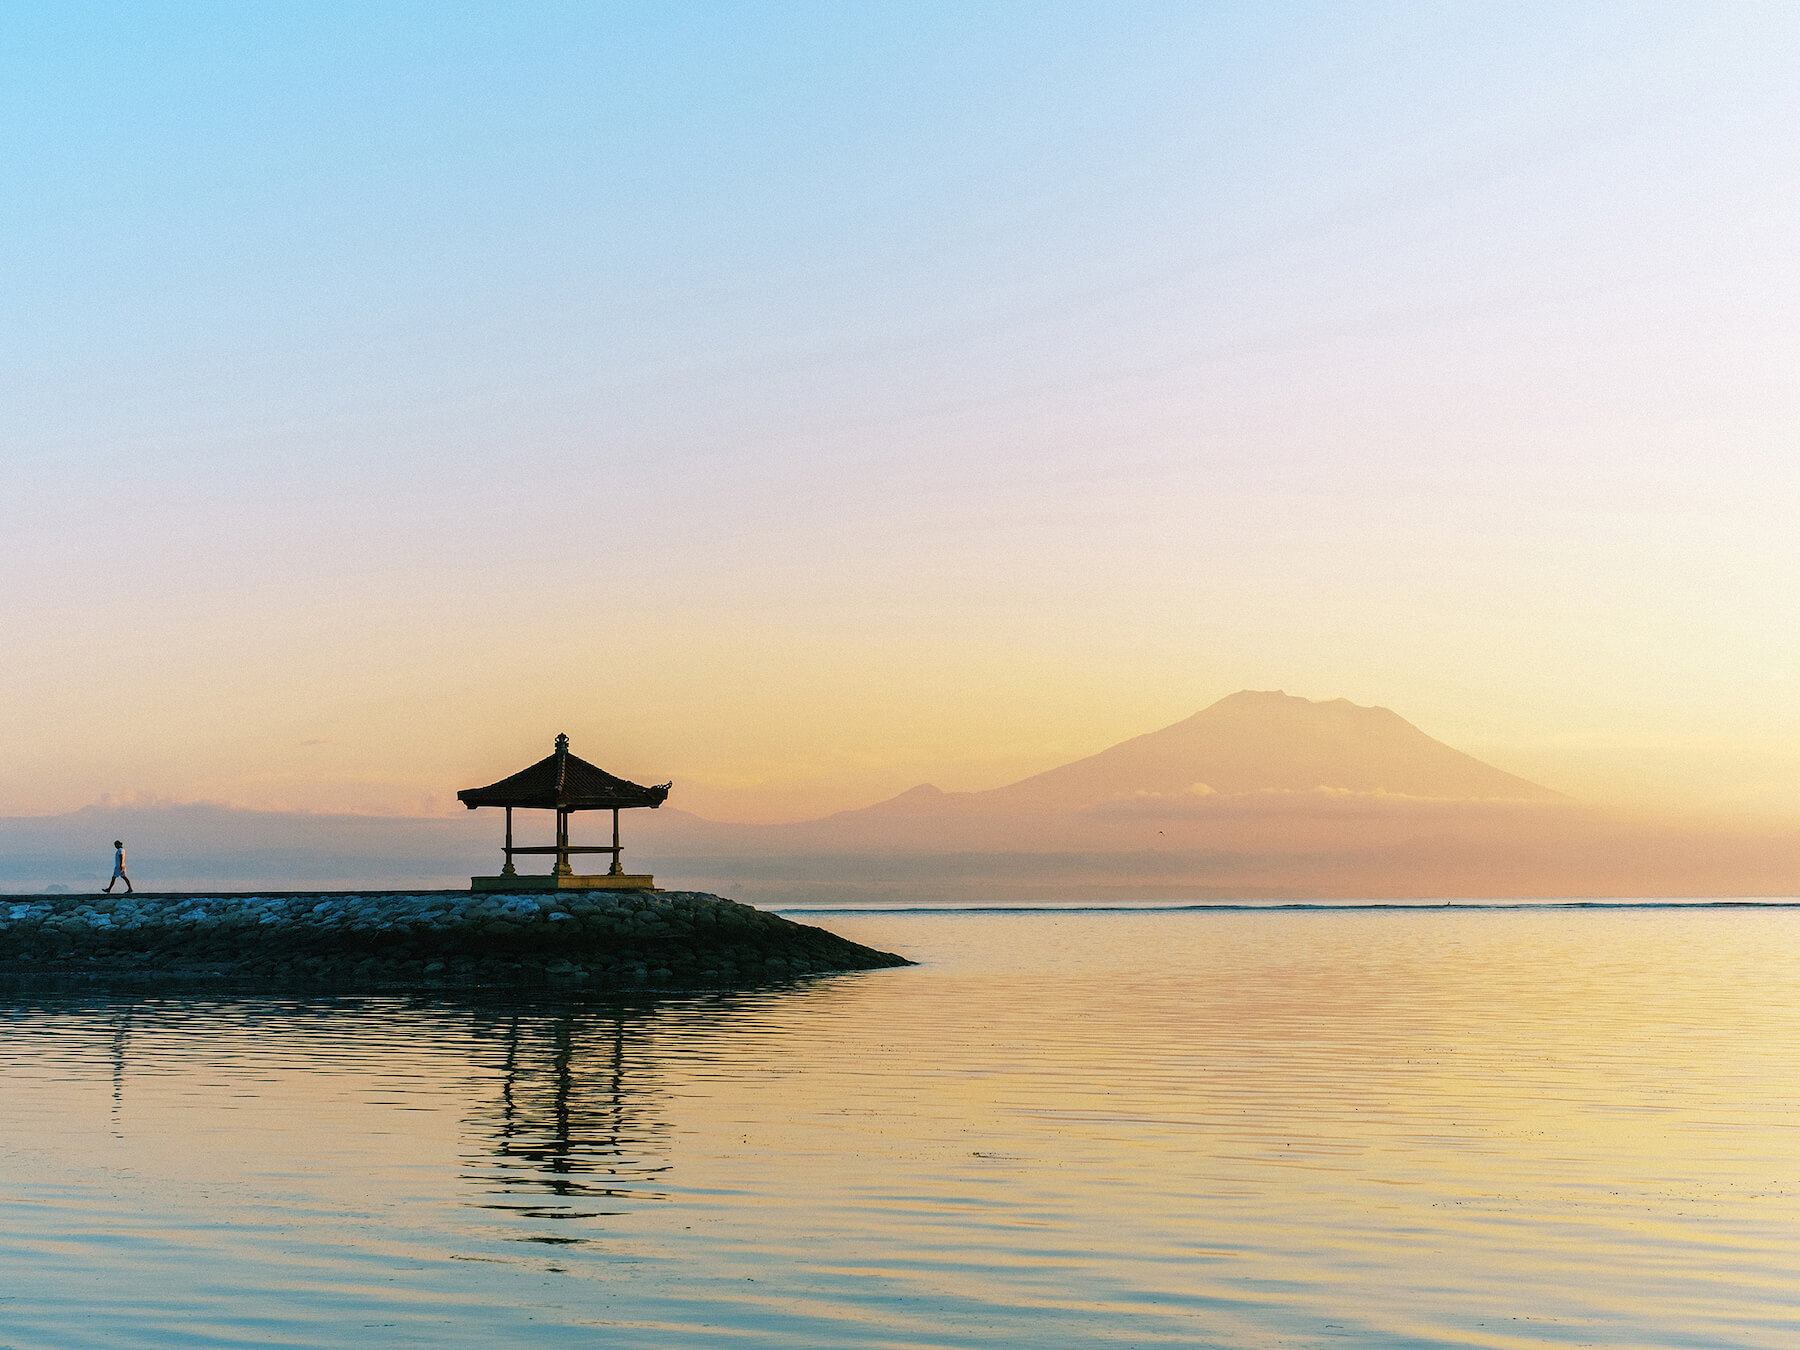 Fine art city print and travel home decor from Sanur Beach Bali, Indonesia